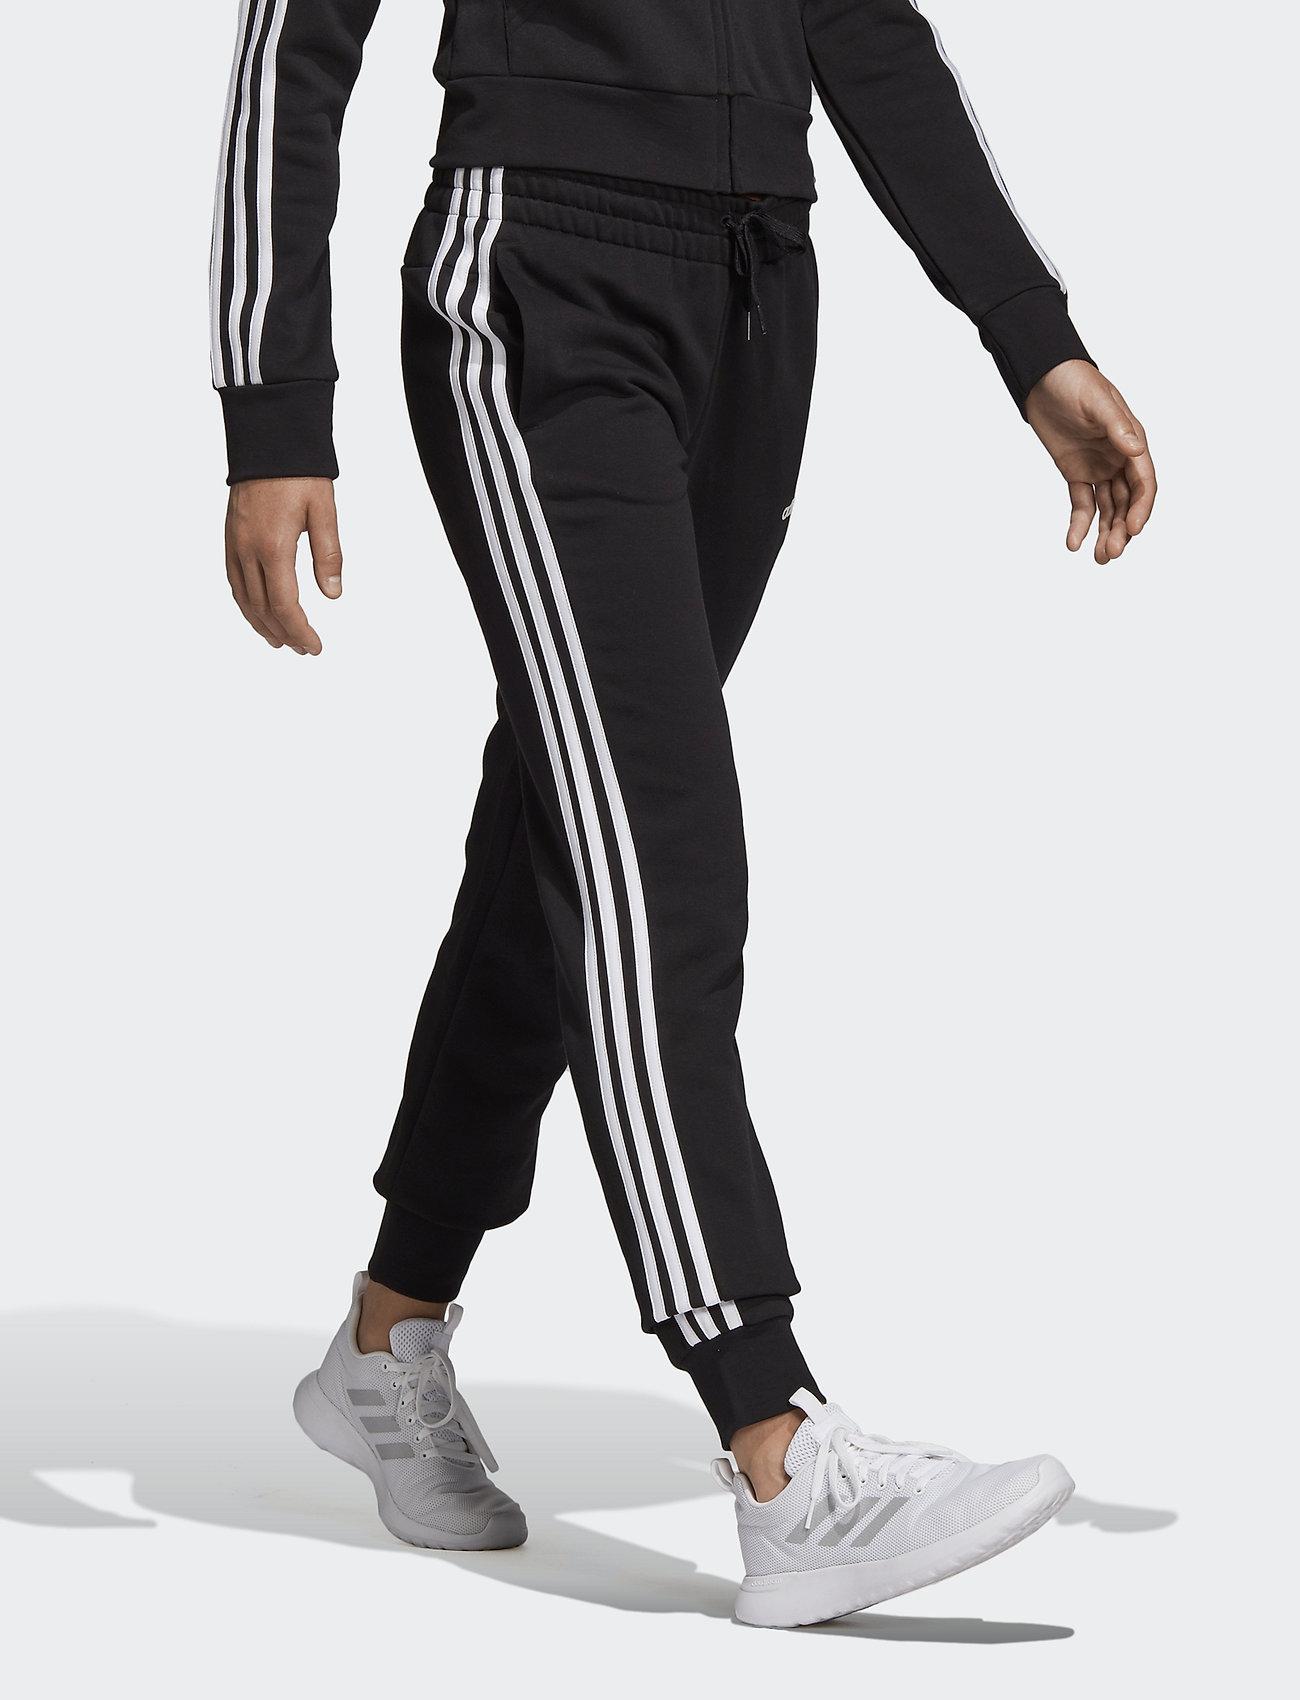 adidas Performance - Essentials 3-Stripes Pants W - trainingsbroek - black/white - 0